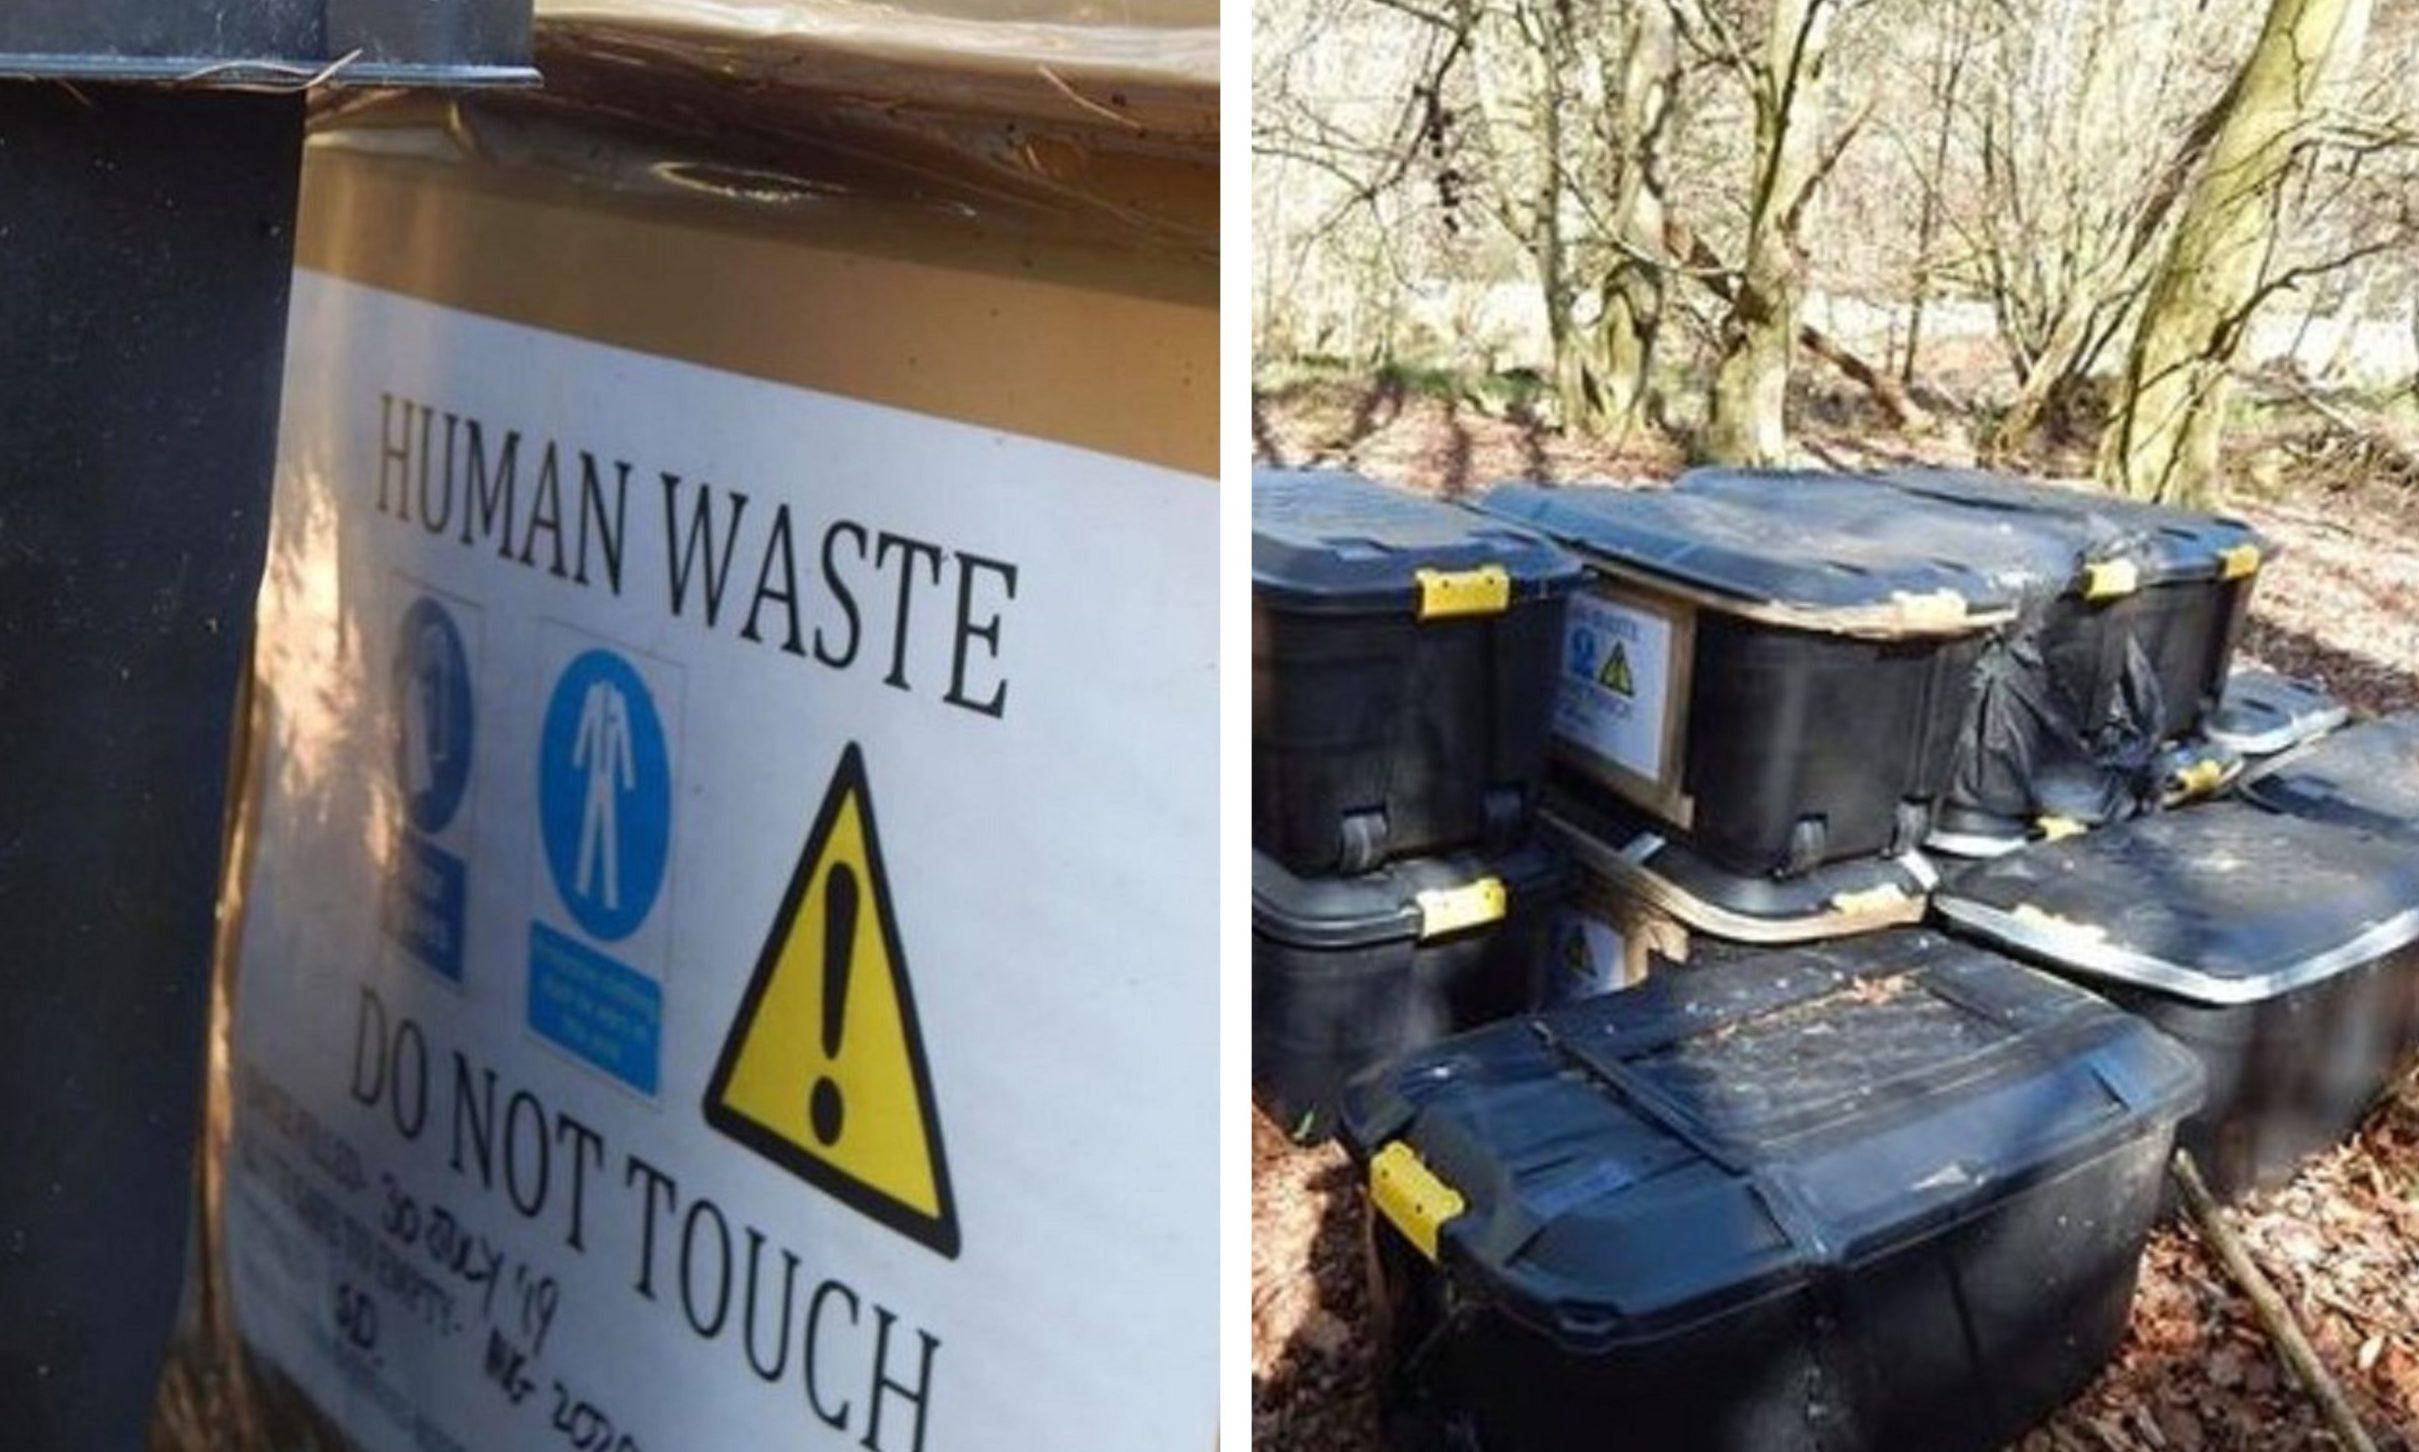 The human waste was found near Falkland.